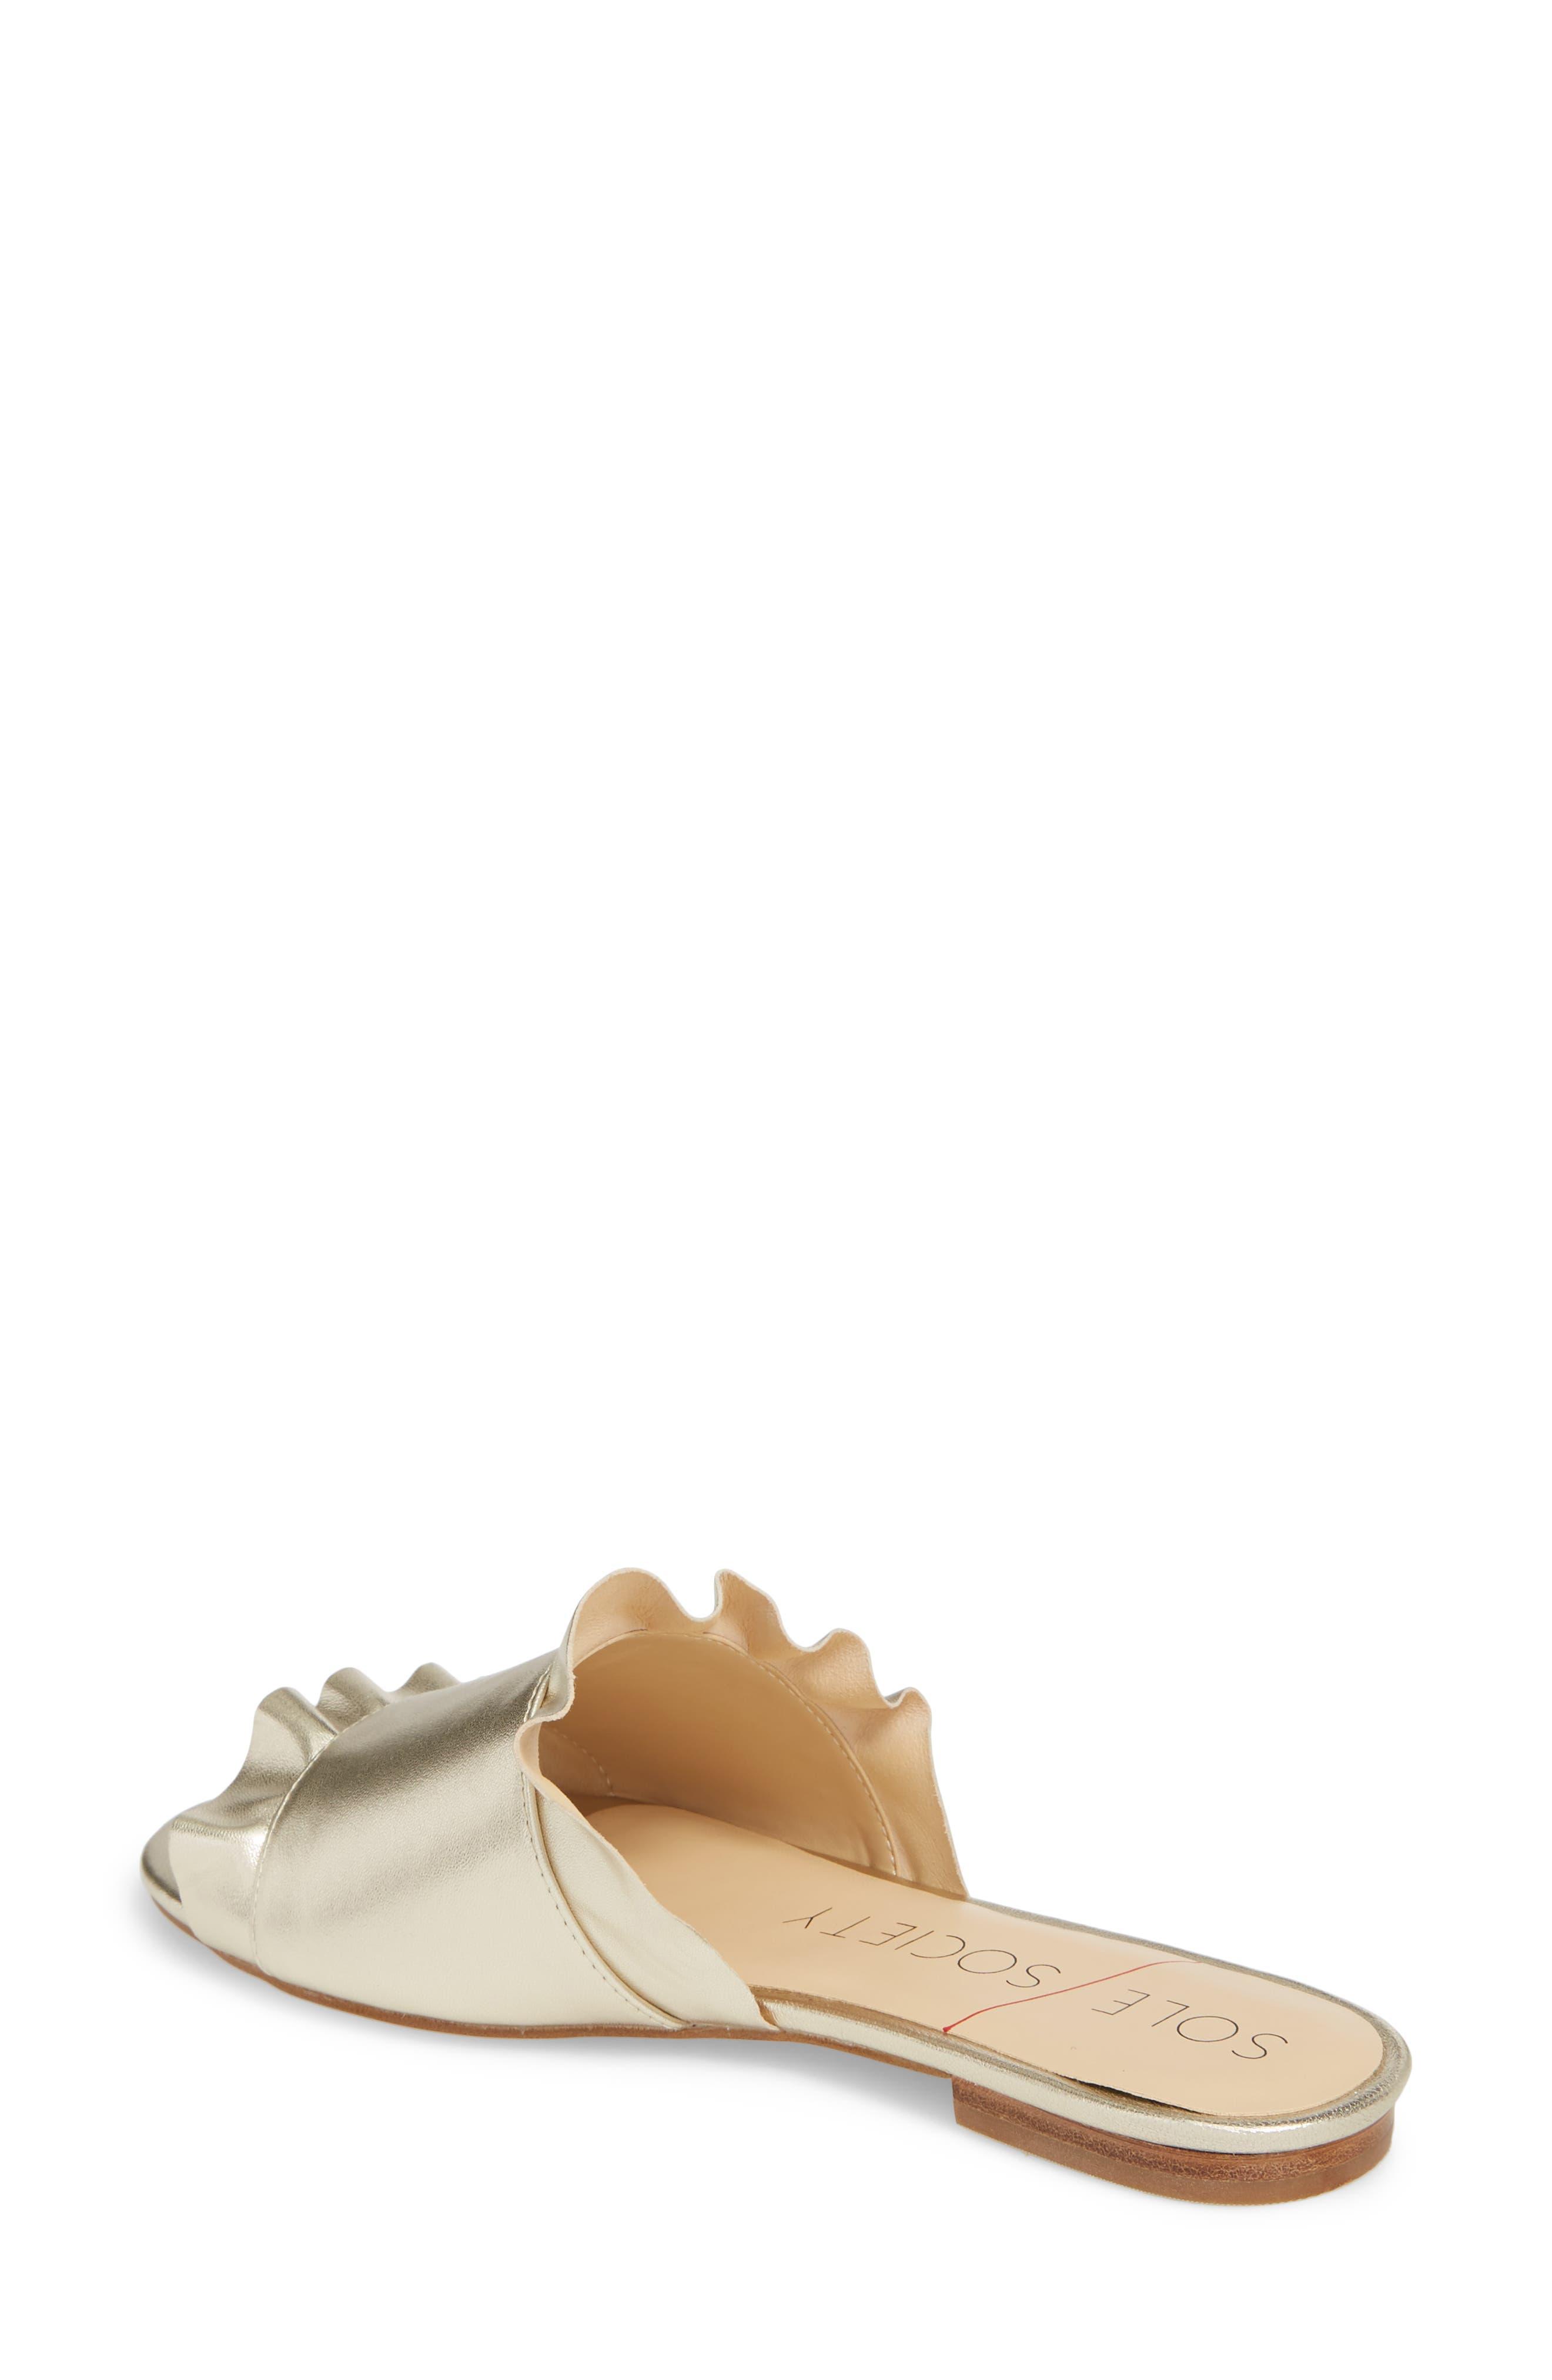 So-Madalayne Flat Sandal,                             Alternate thumbnail 2, color,                             Totes Gold